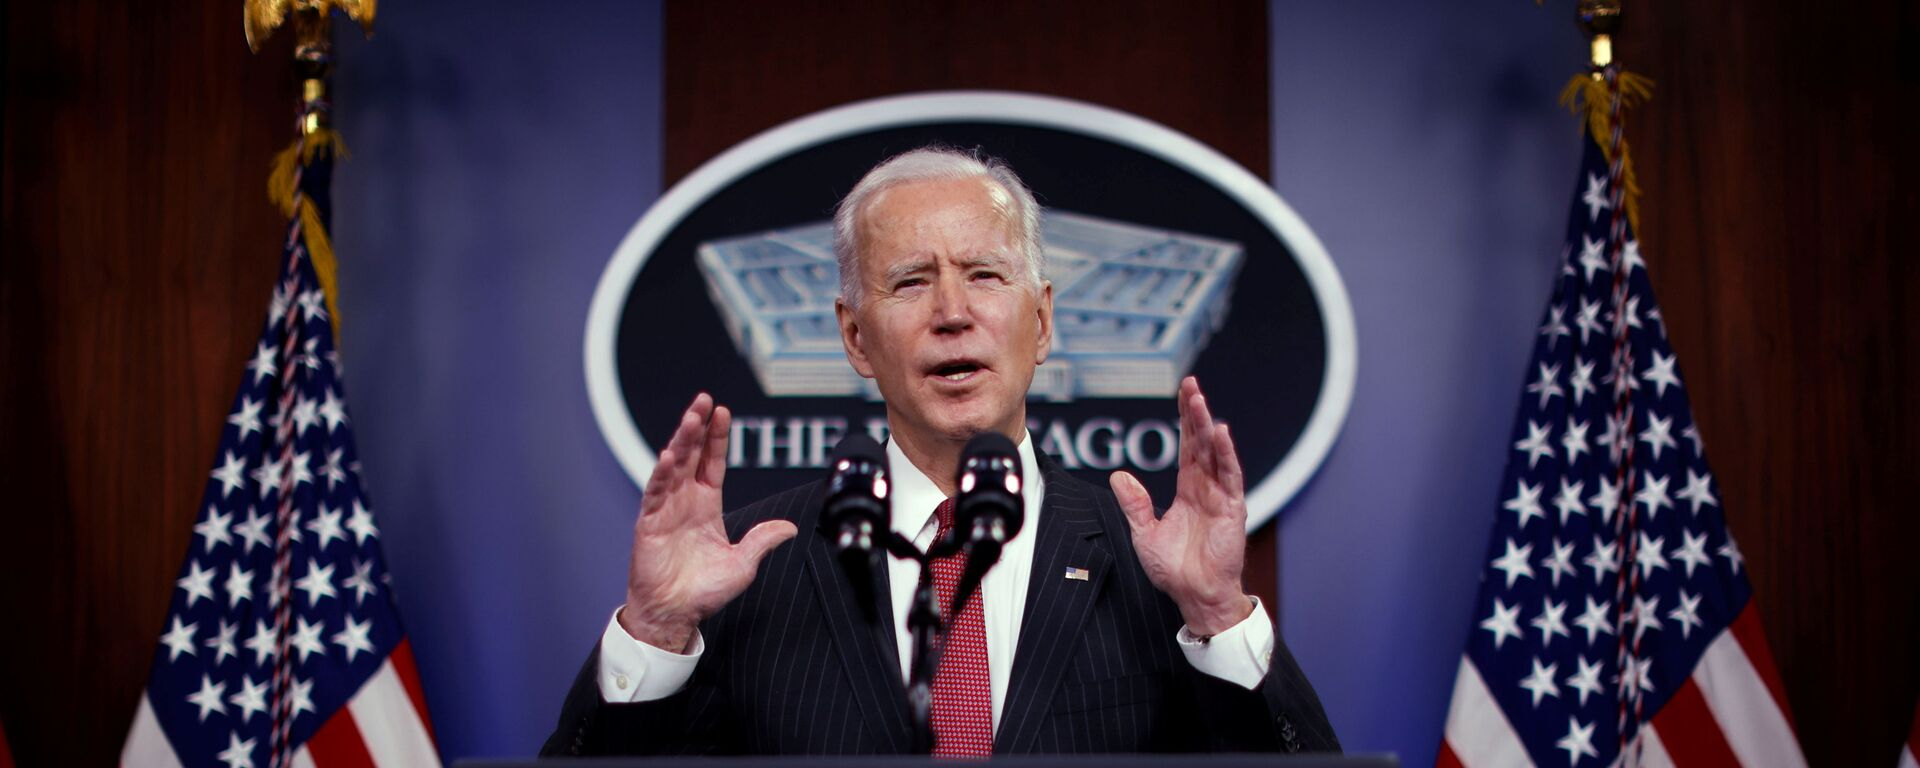 Joe Biden, presidente de EEUU - Sputnik Mundo, 1920, 20.02.2021